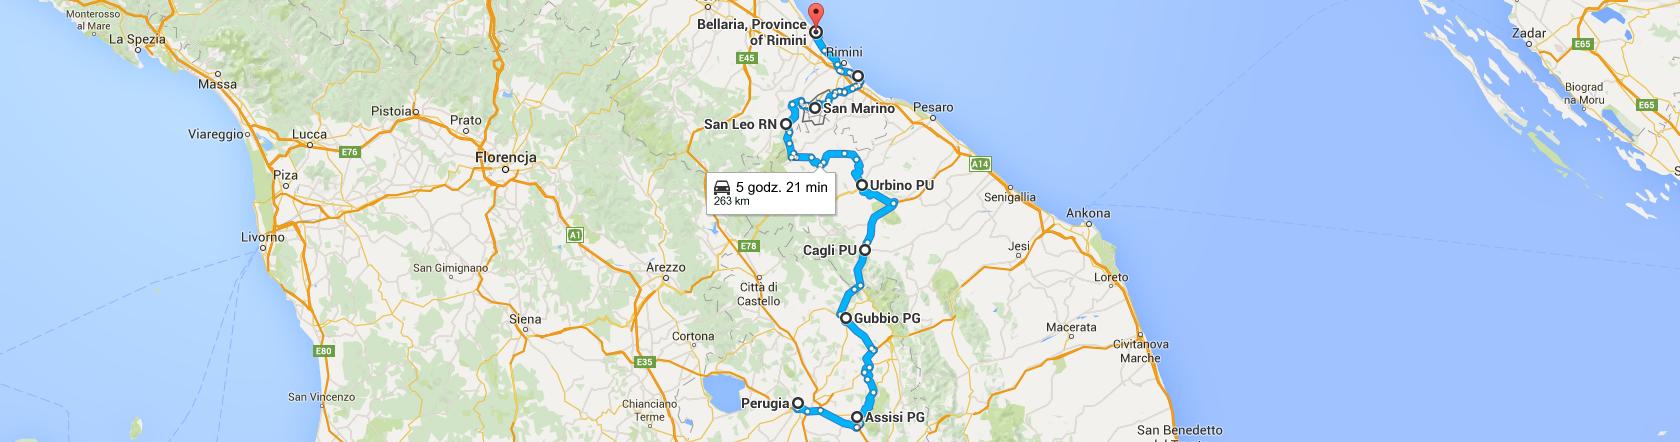 Trasa z Perugii do Bellarii